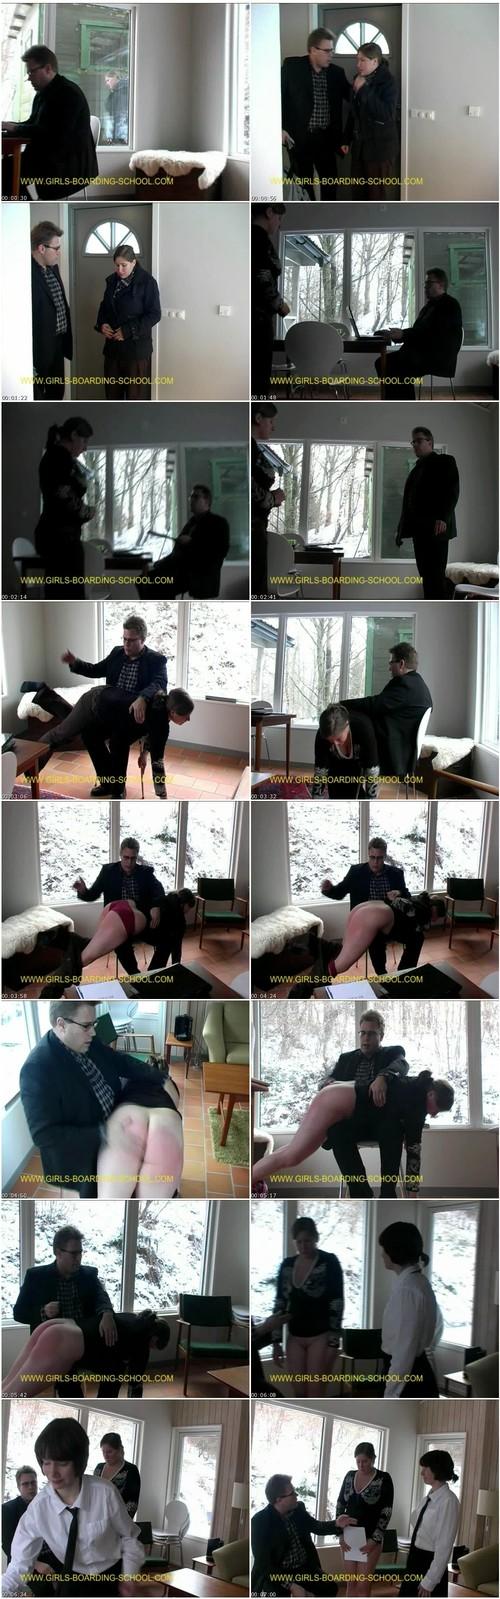 spanking148_thumb_m.jpg